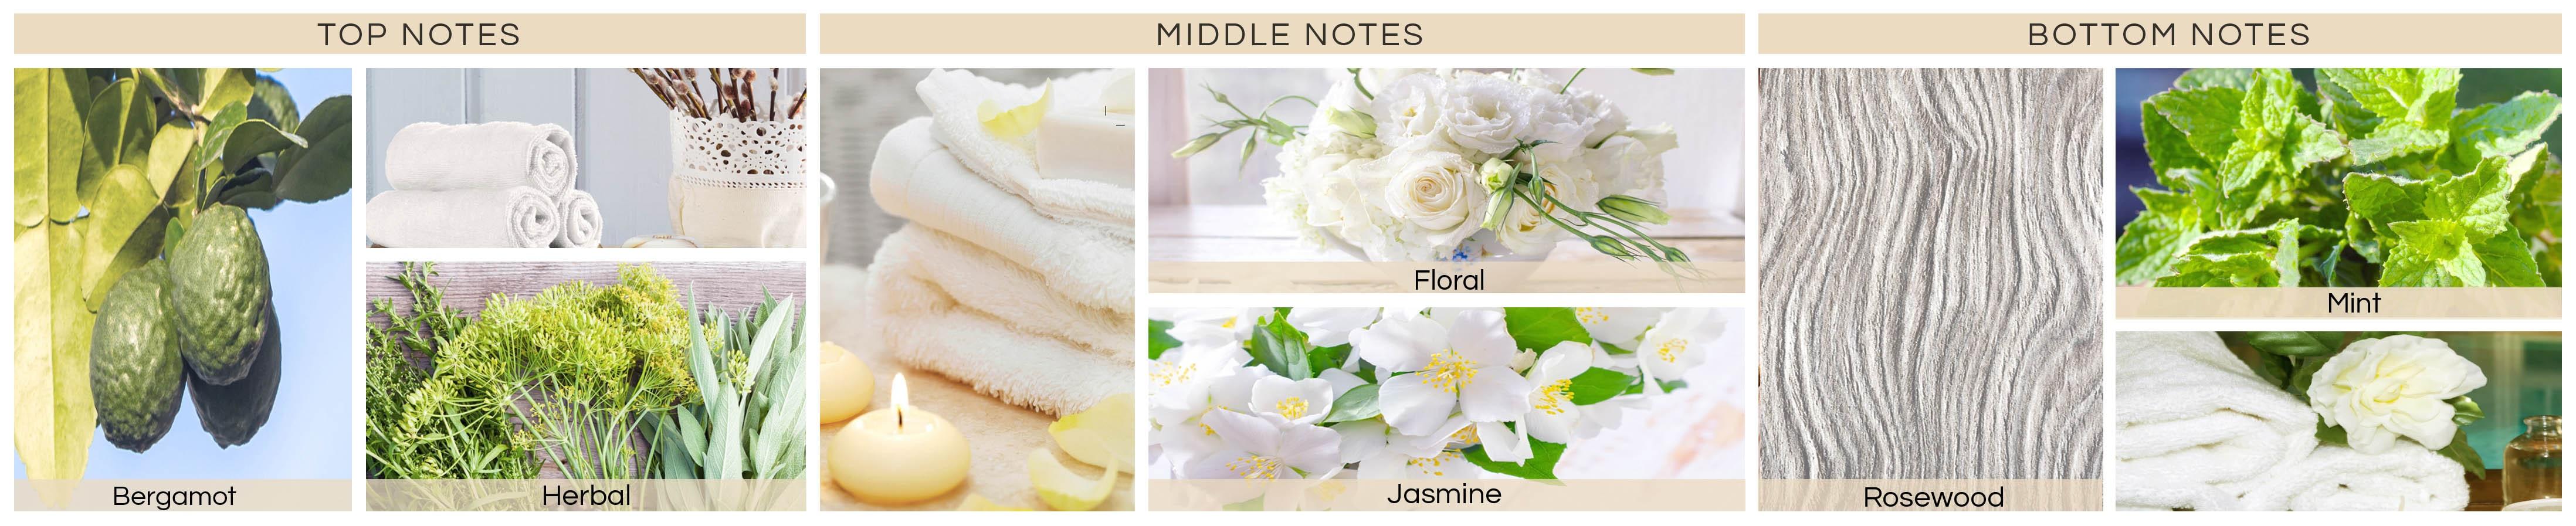 cotton-soft-jpg57602e978d706-min591c01217964f